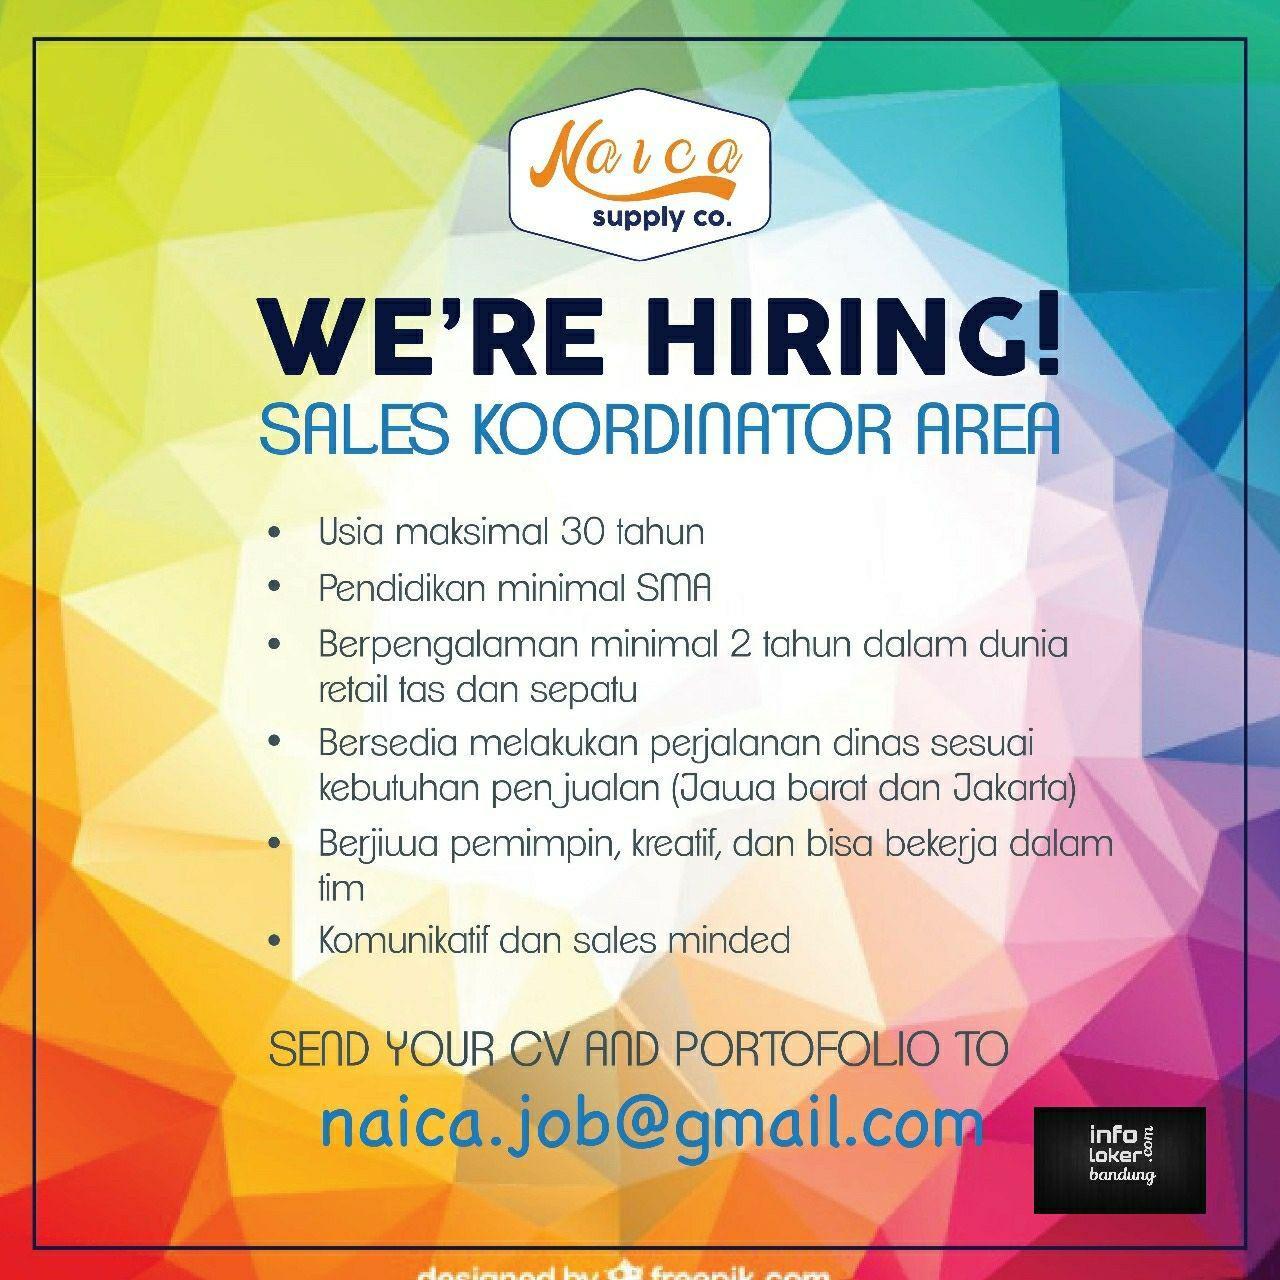 Lowongan Kerja Sales Koordinator Area Naica Supply Co Agustus 2017